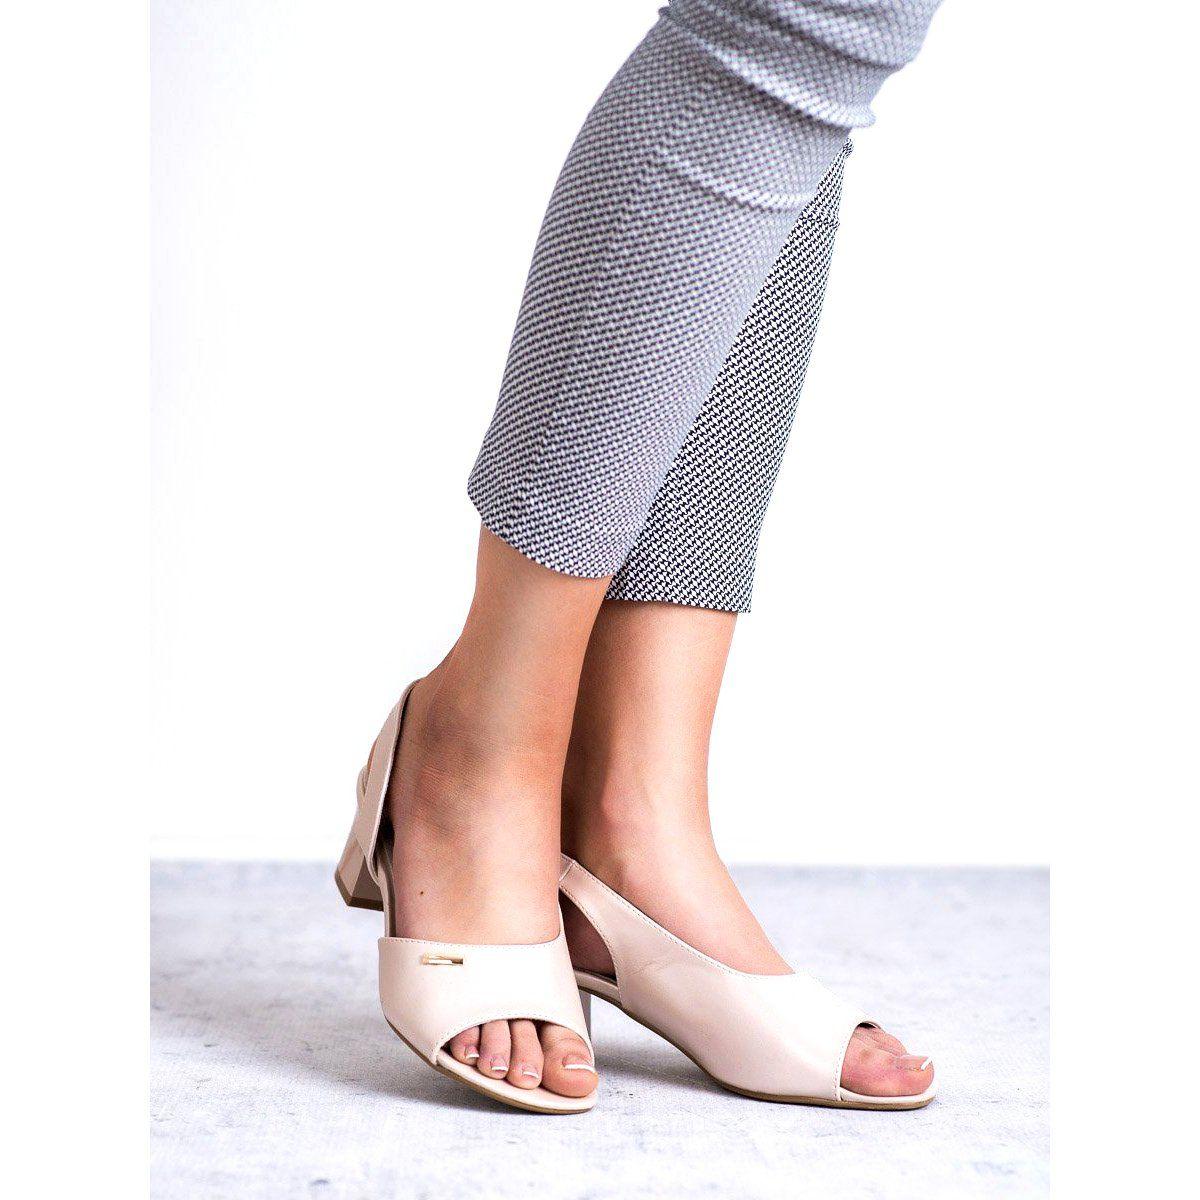 Sandaly Damskie Goodin Goodin Brazowe Eleganckie Wsuwane Sandaly Heels Mule Shoe Shoes